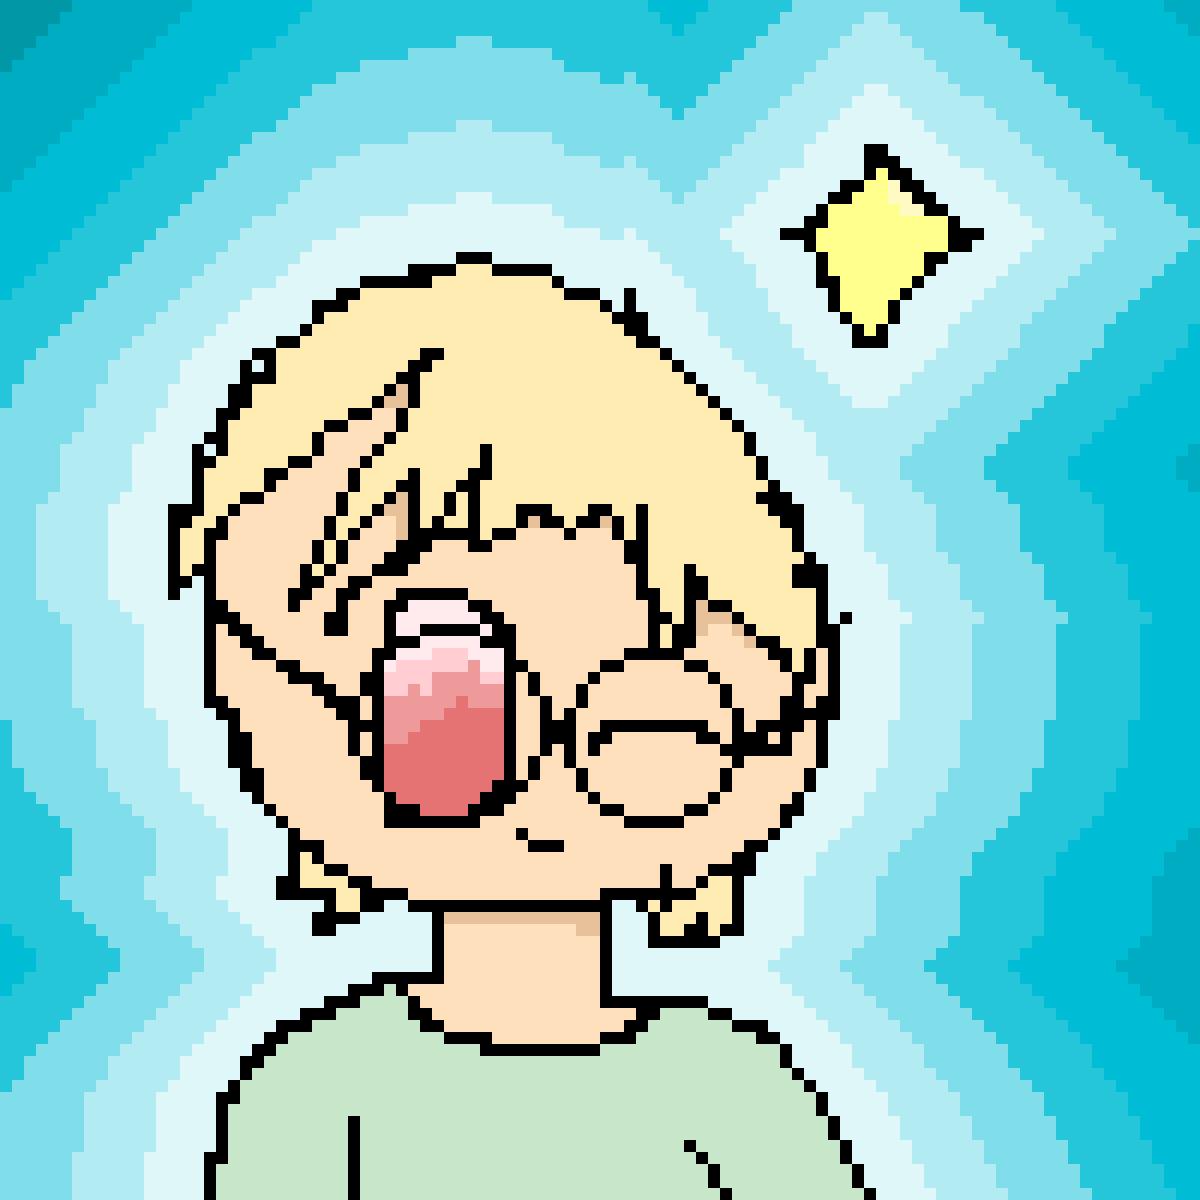 cute gender-neutral bby by stxrlight